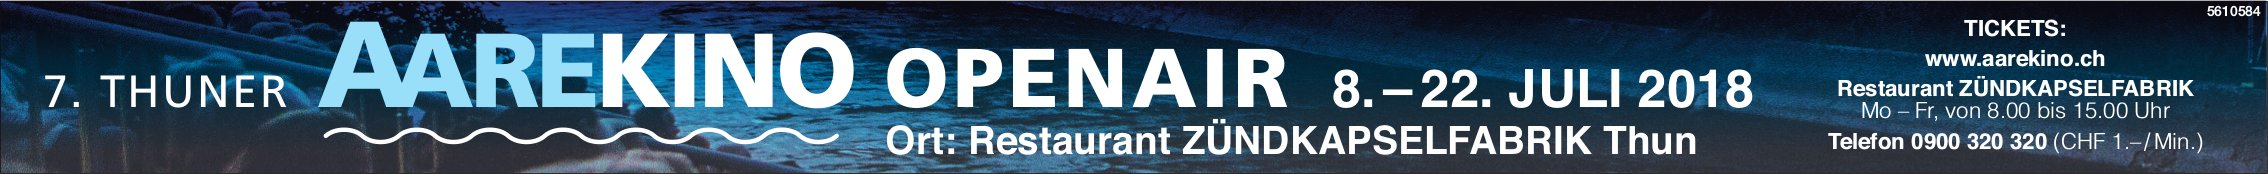 7. Thuner Aarekino Openair, 8. - 22. Juli, Restaurant Zündkapselfabrik, Thun